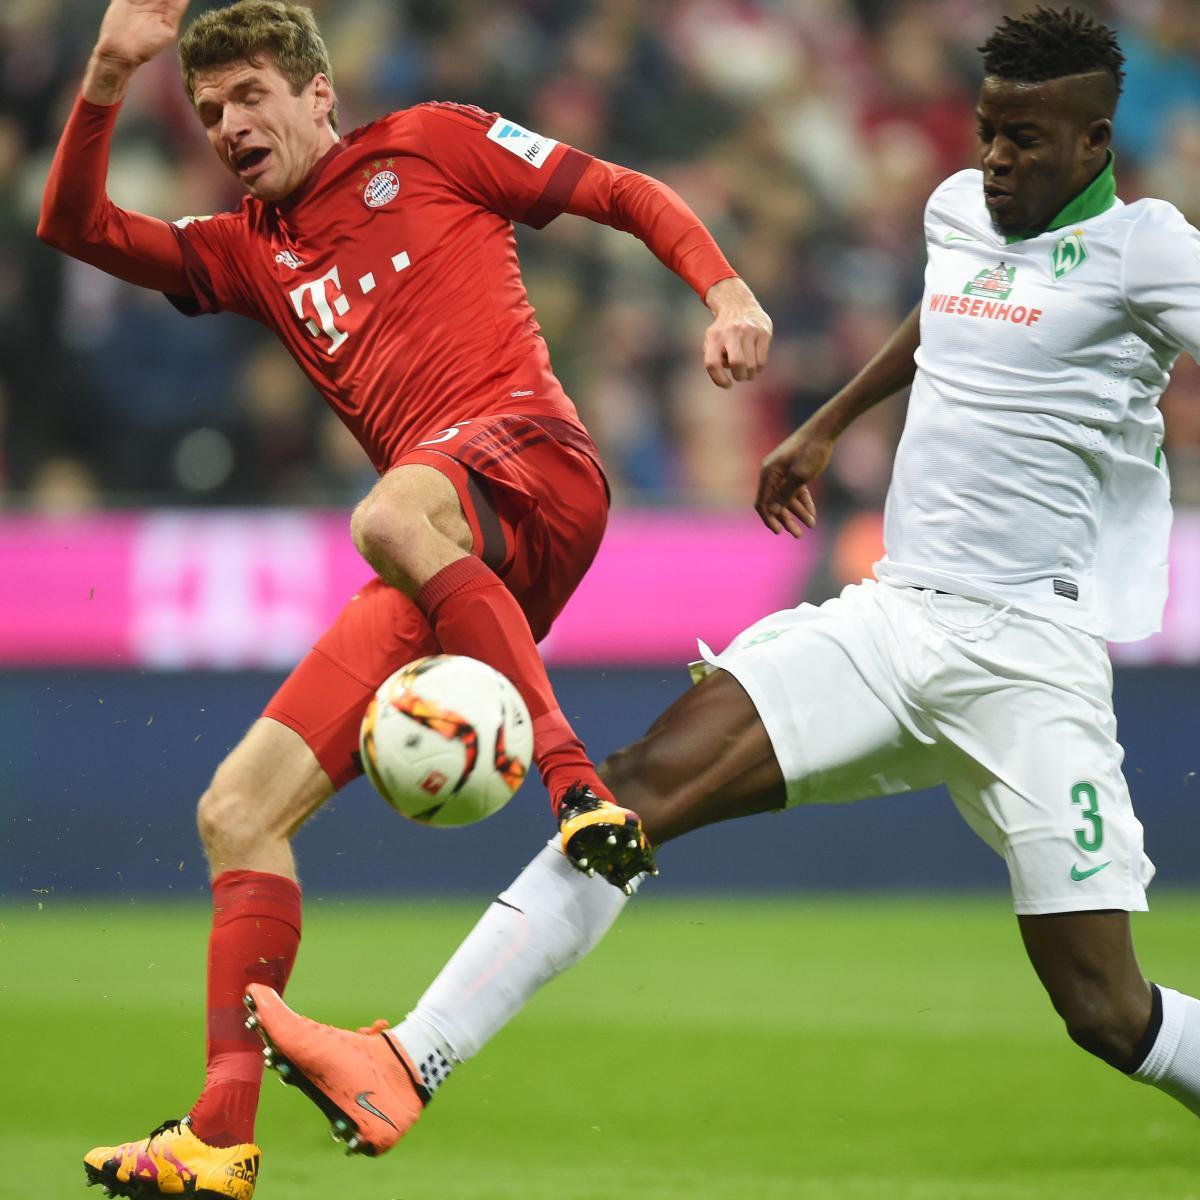 Bayern Vs Bremen Live Stream